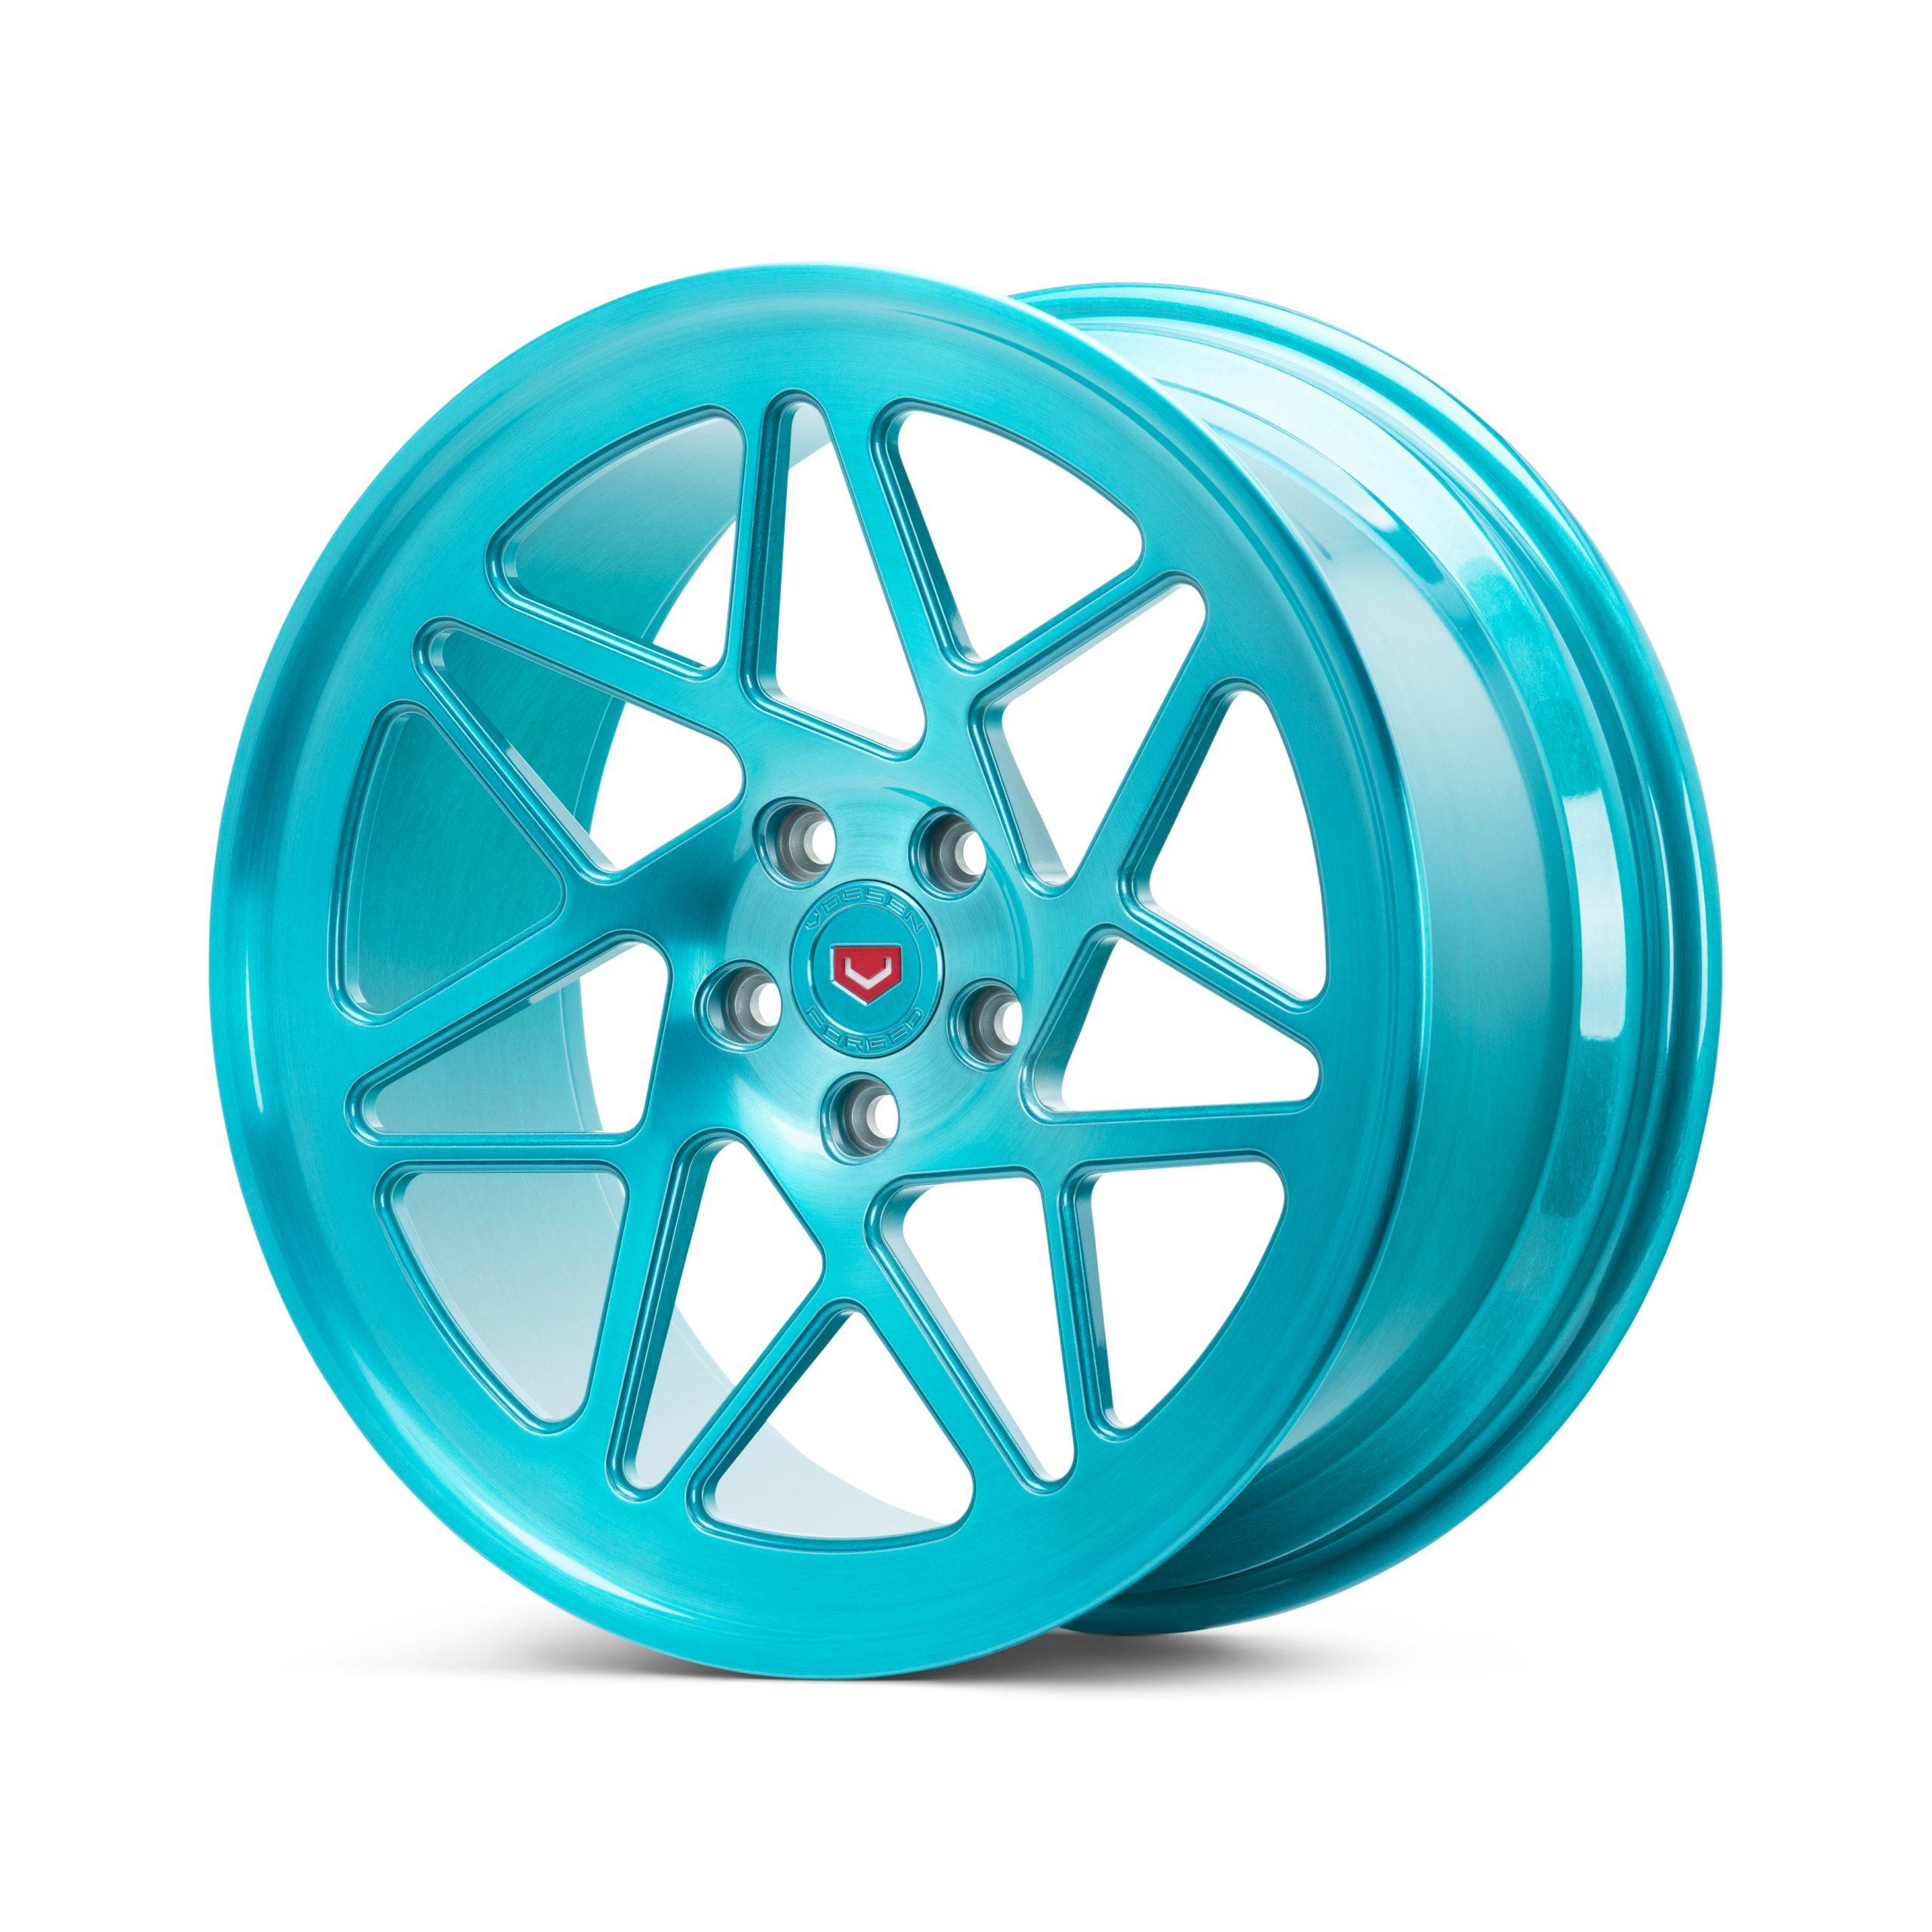 vossen-forged-lc-109t-wheel---c21-deco-teal---lc-series----vossen-wheels-2018--1006_28472072678_o